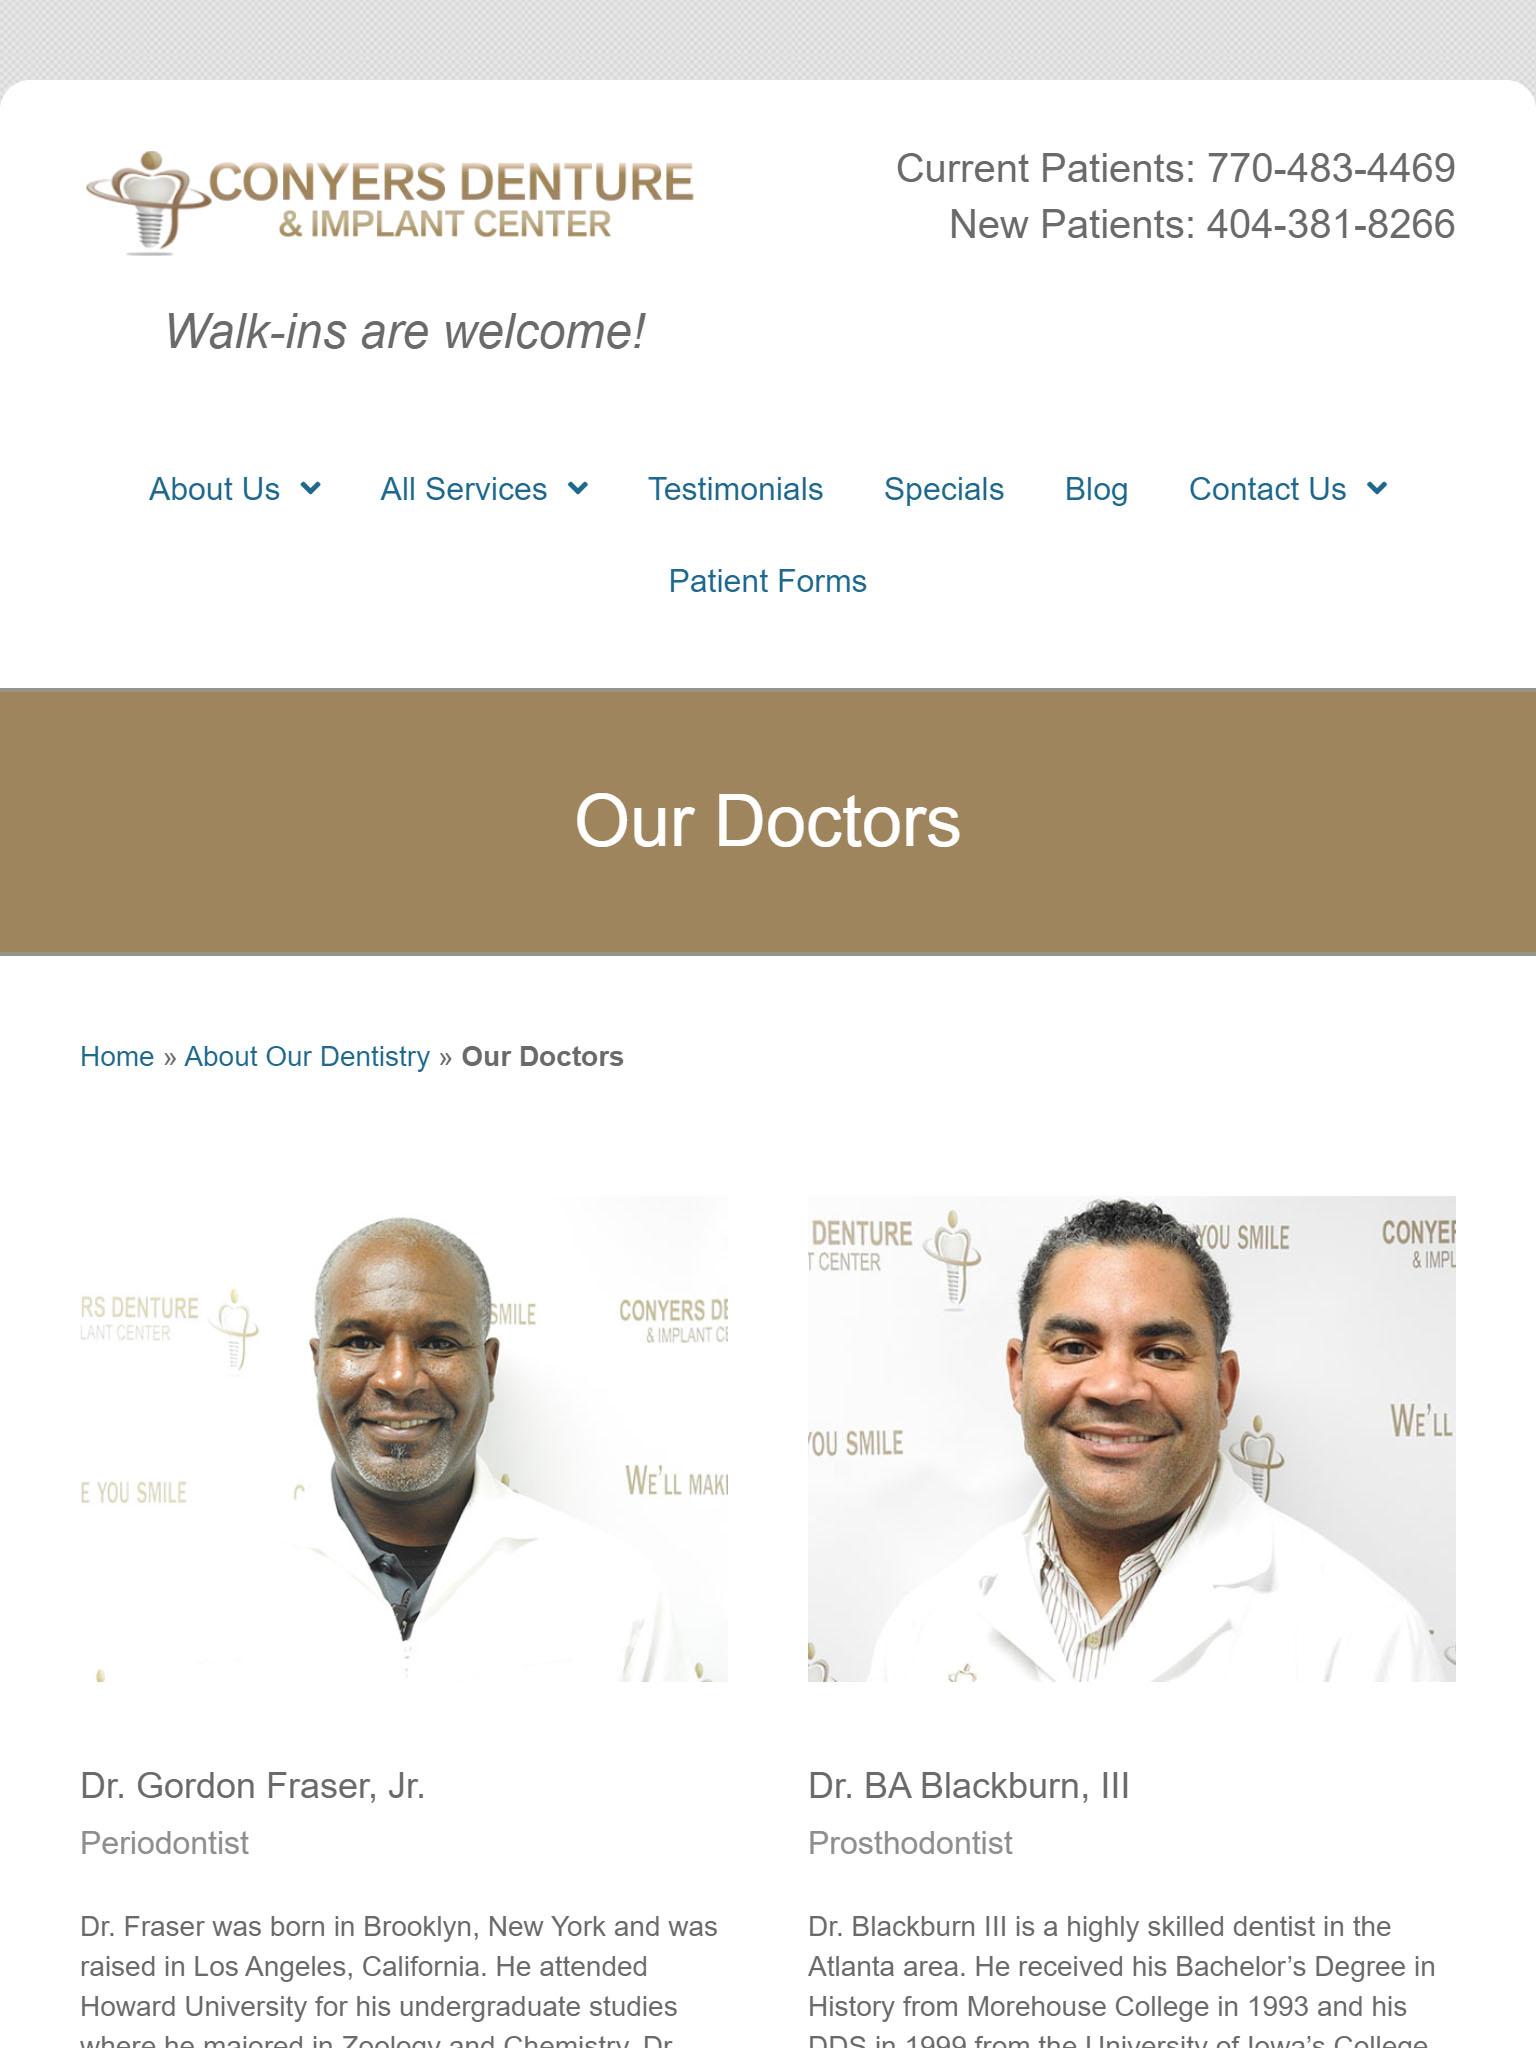 Conyers Denture & Implant Center Tablet Web Design